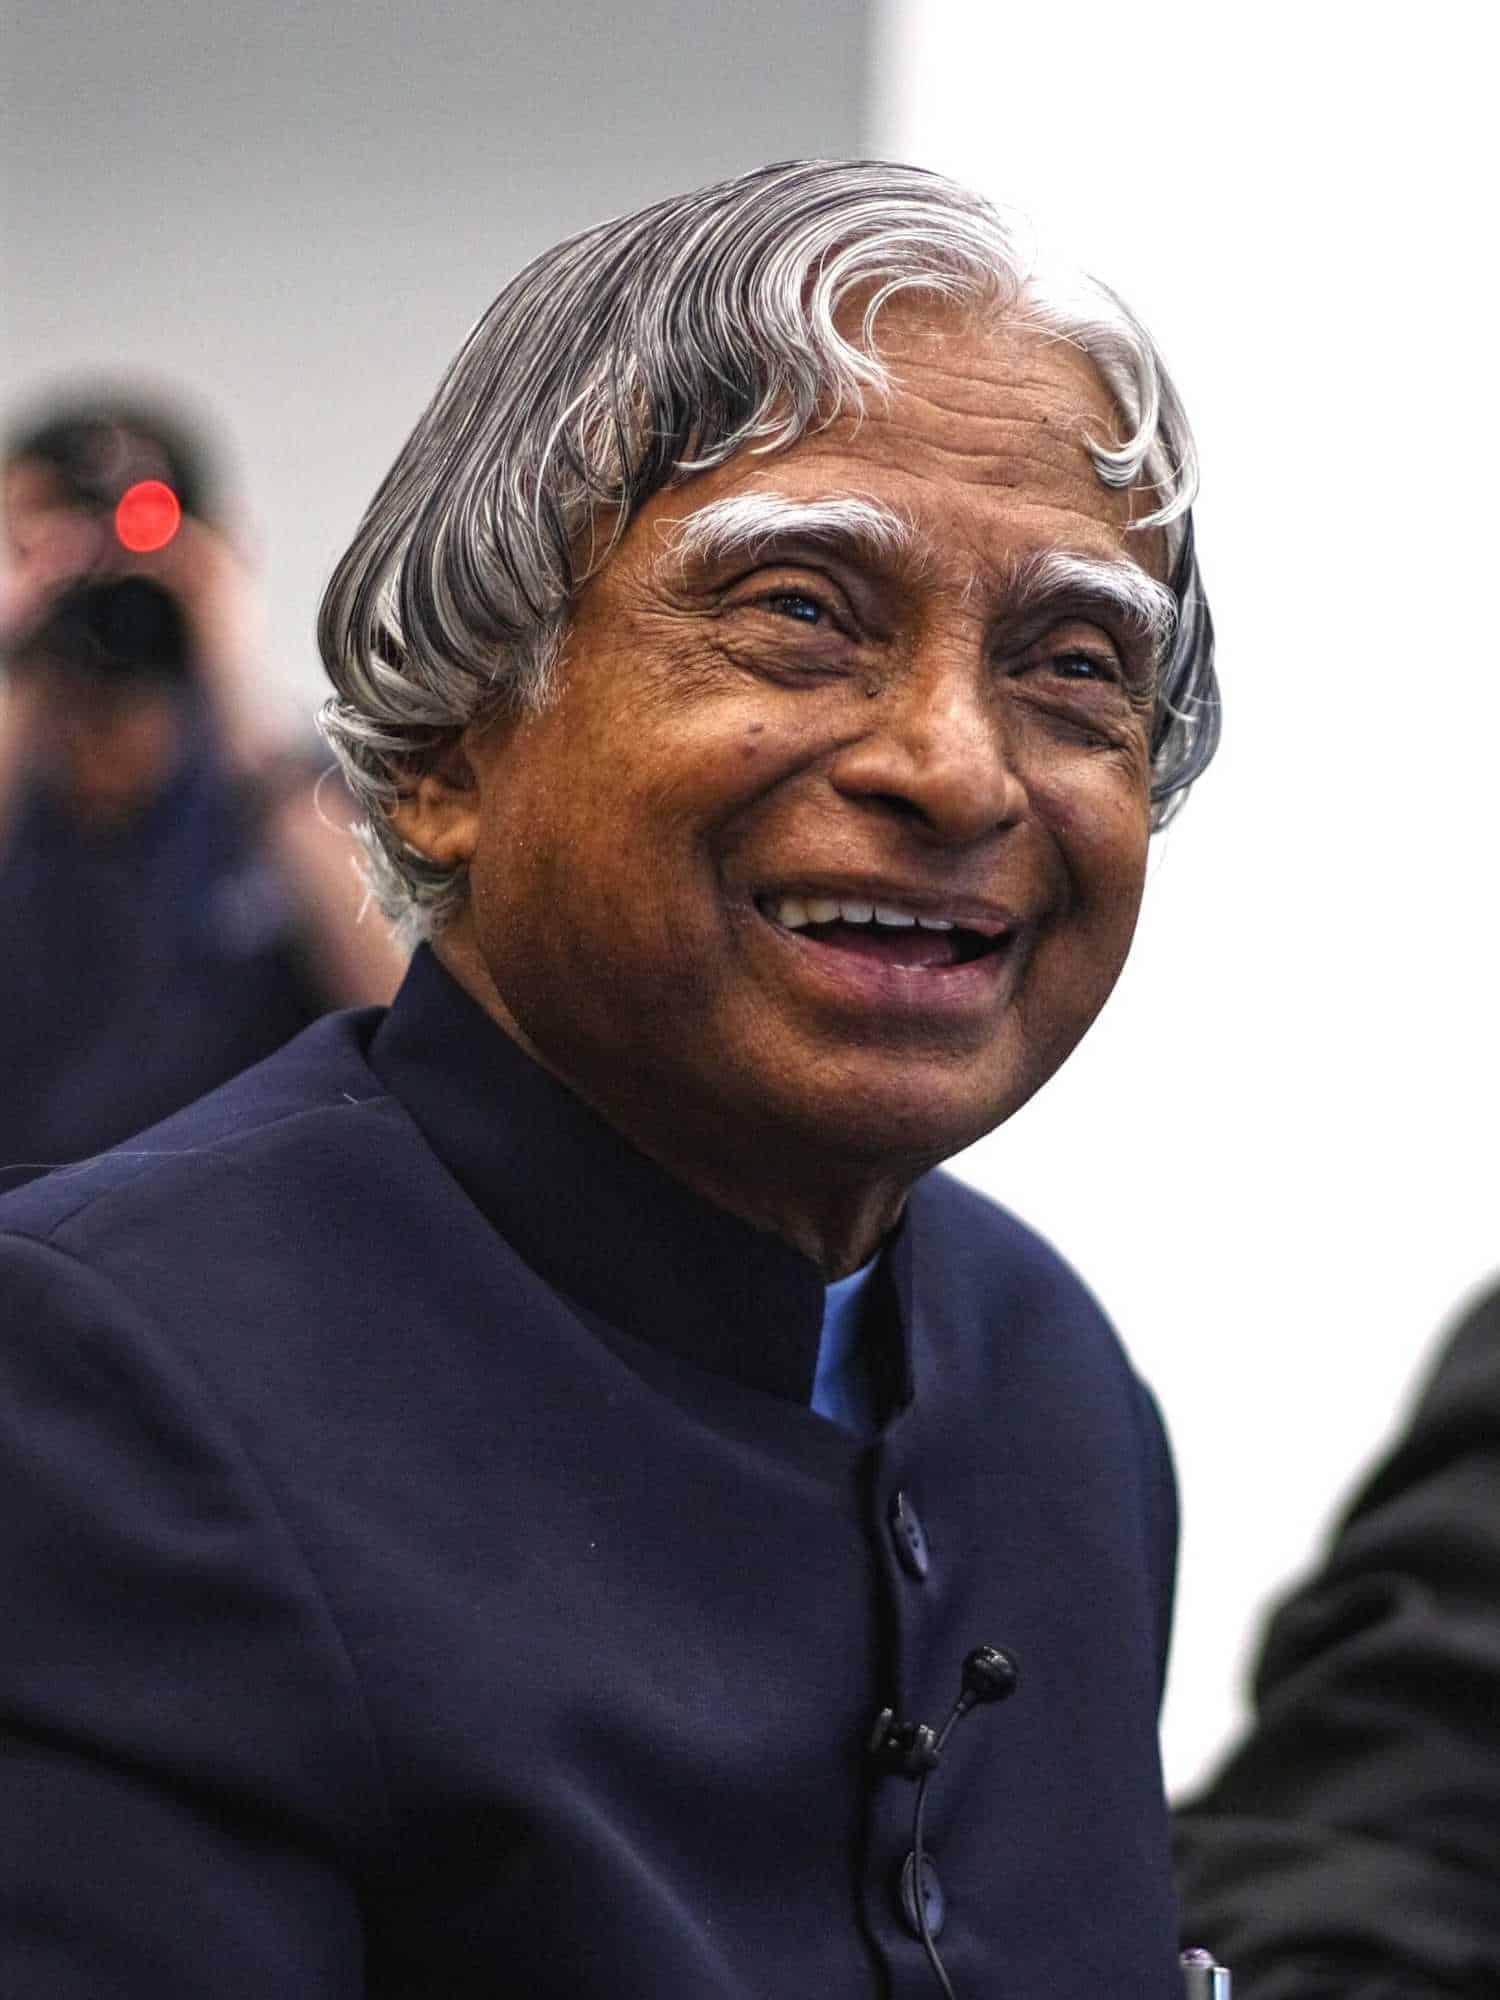 ए॰ पी॰ जे॰ अब्दुल कलाम A. P. J. Abdul Kalam